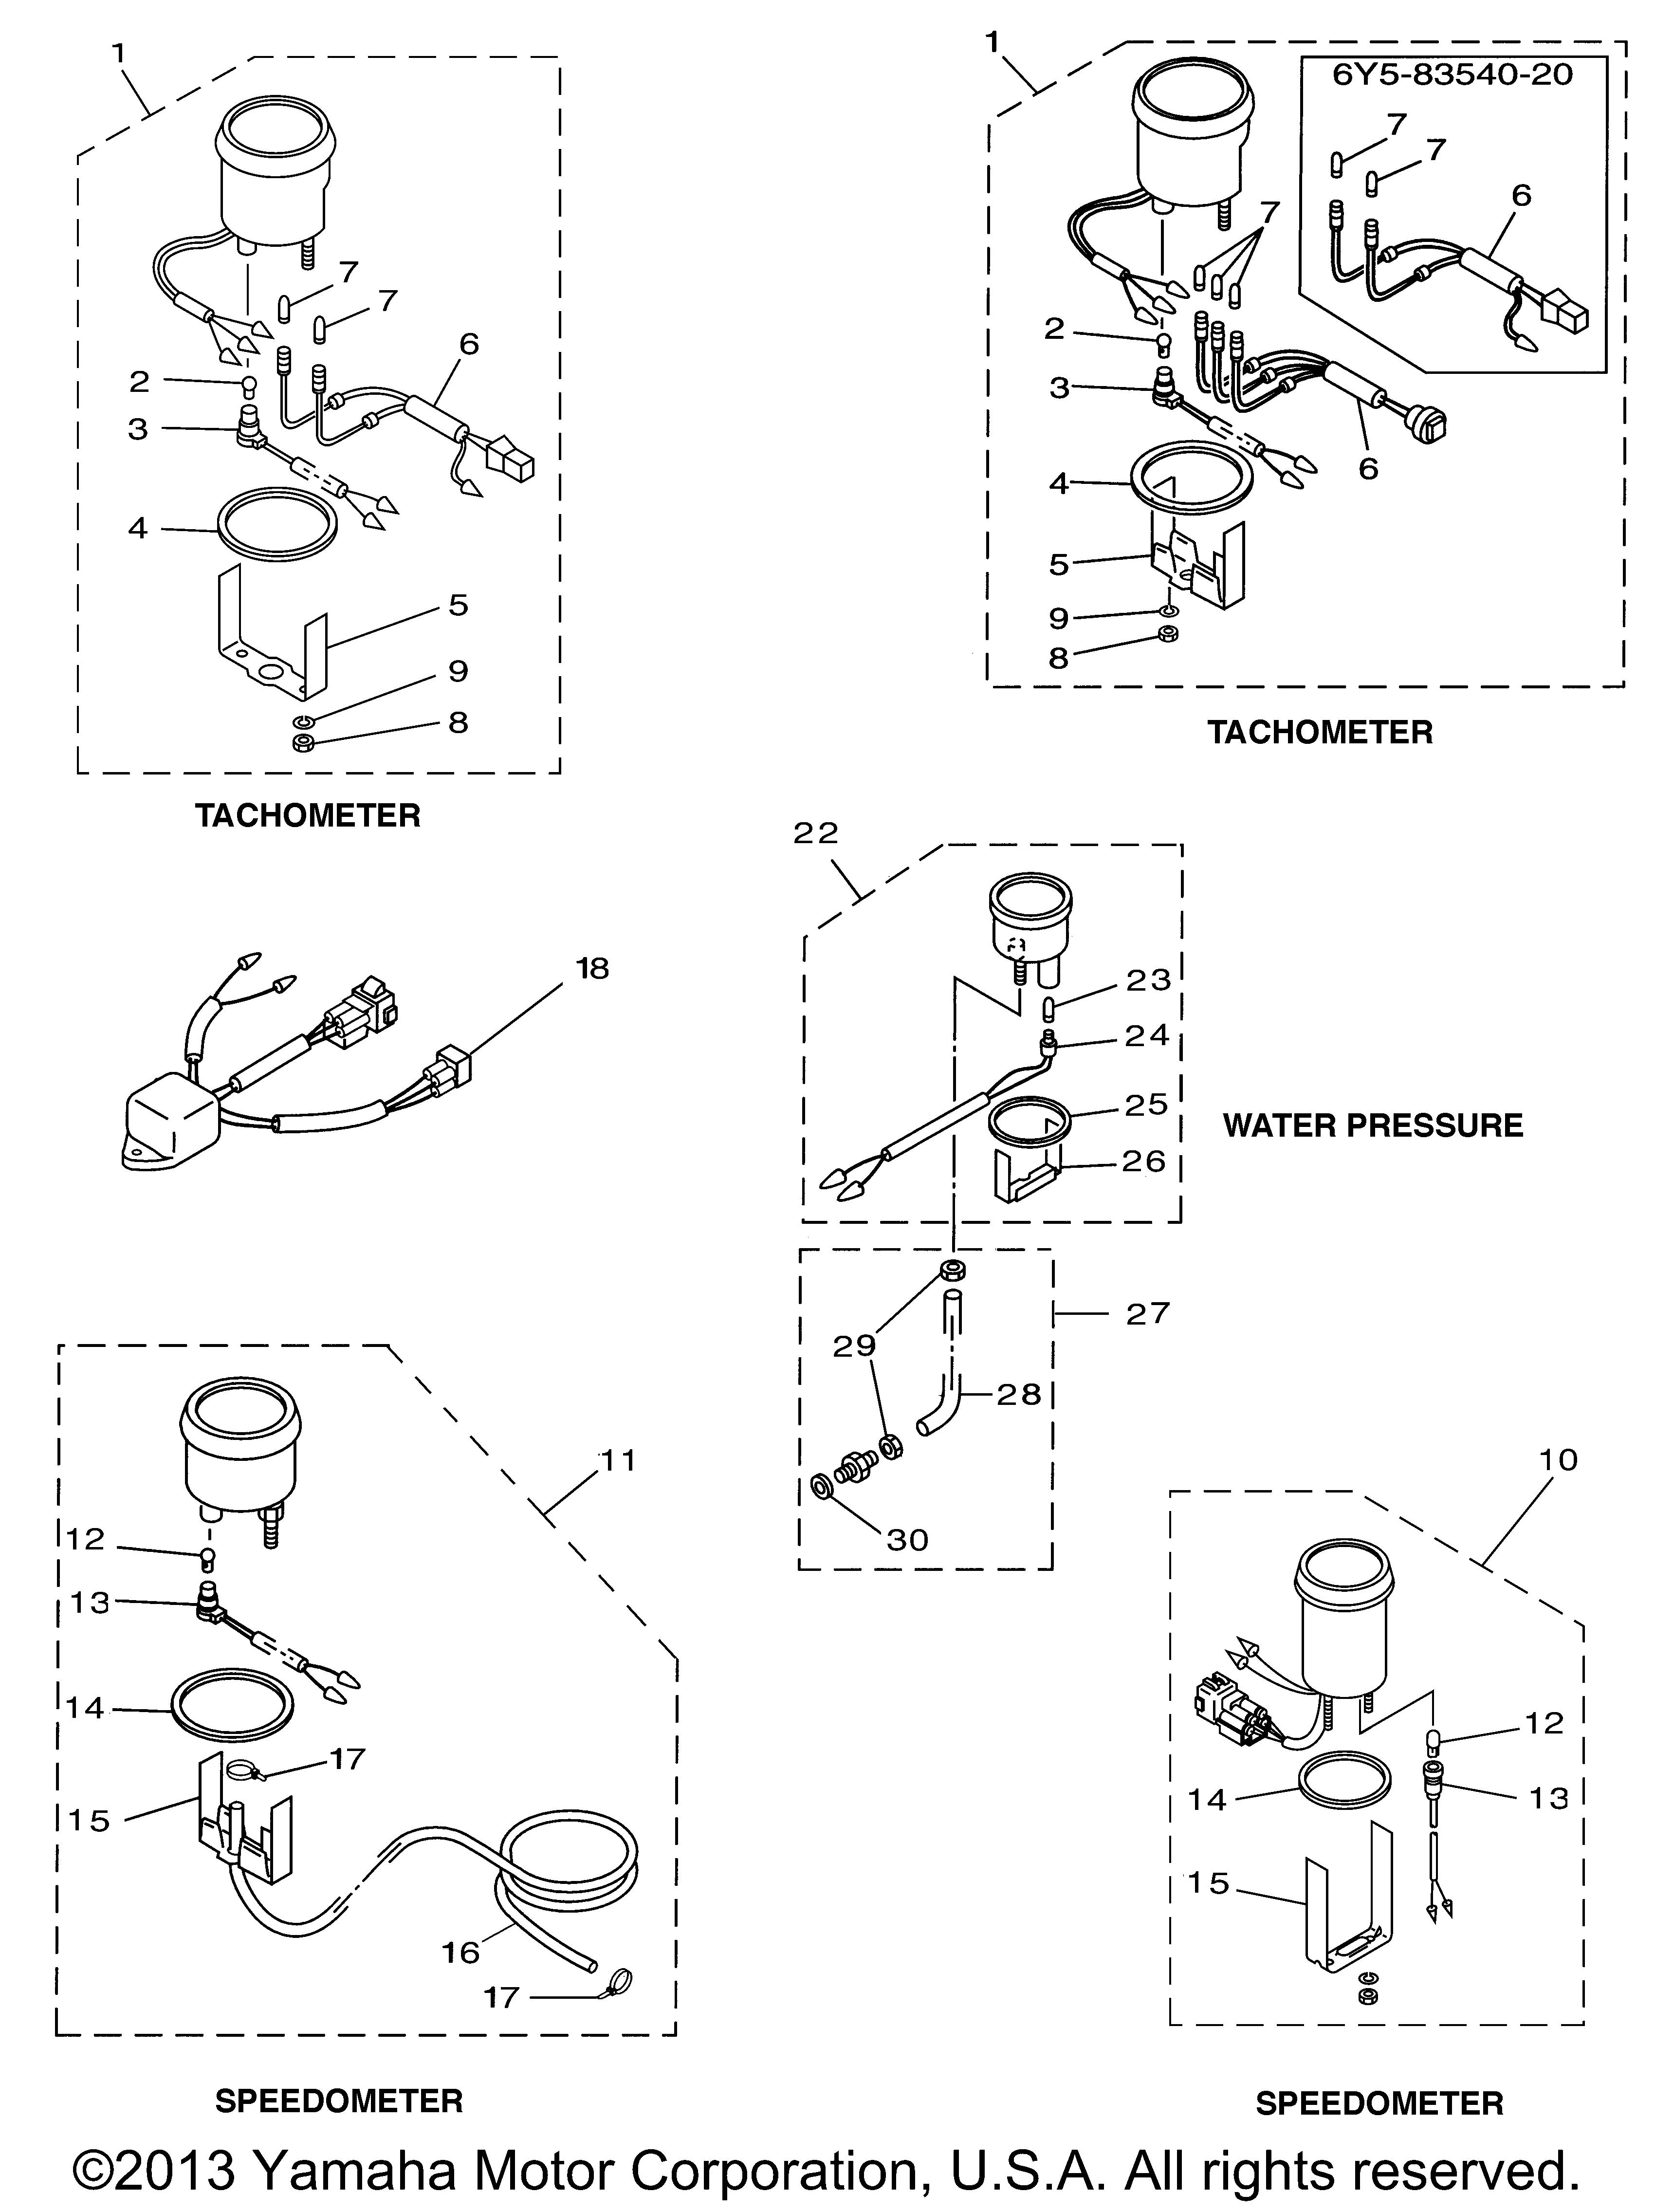 yamaha outboard speedometer tube